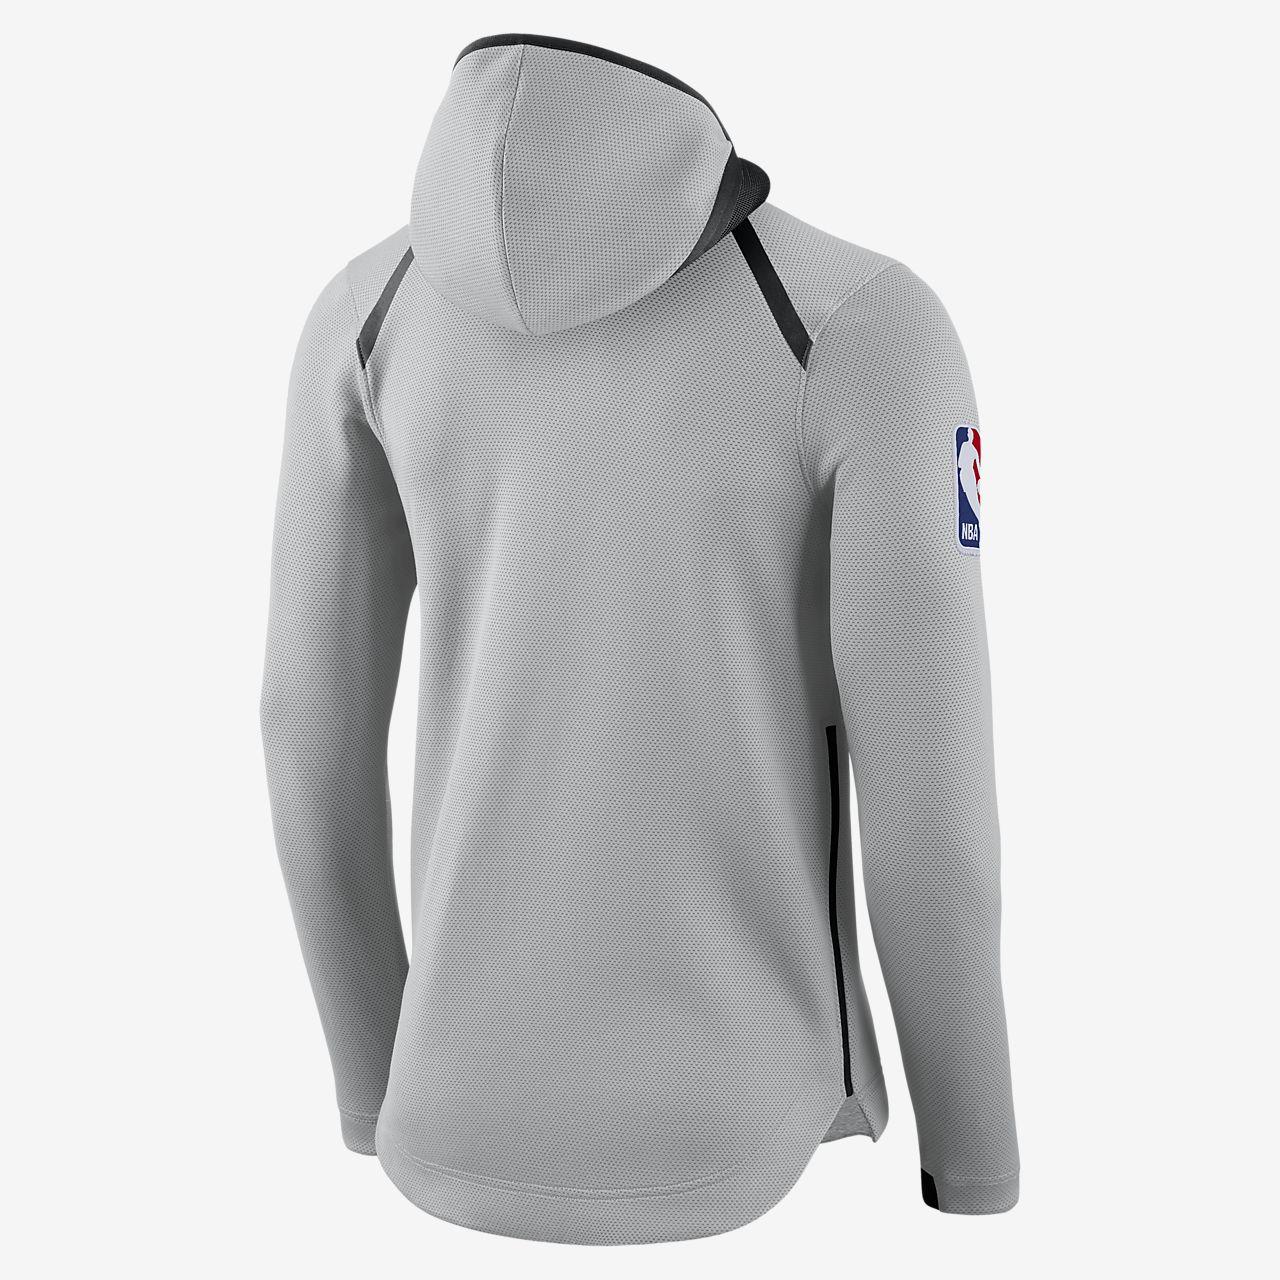 6f9f6a71ca31 San Antonio Spurs Nike Therma Flex Showtime Men s NBA Hoodie. Nike.com